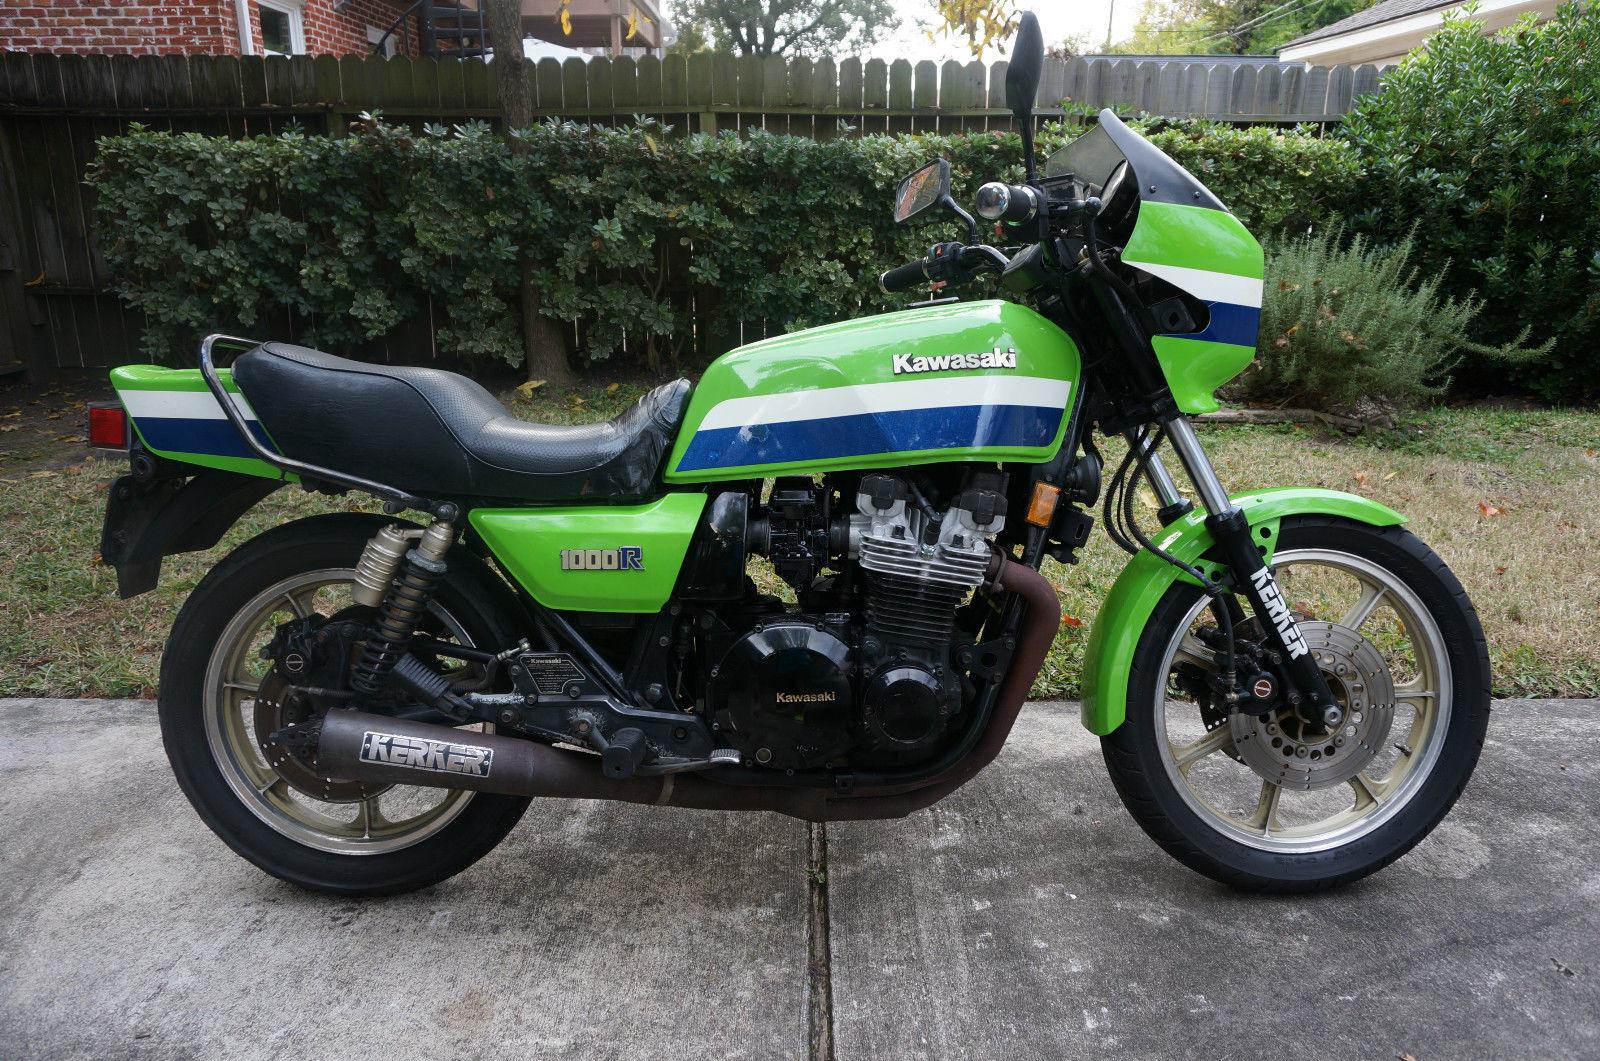 Eddie Lawson Replica 1982 Kawasaki Kz1000r Elr For